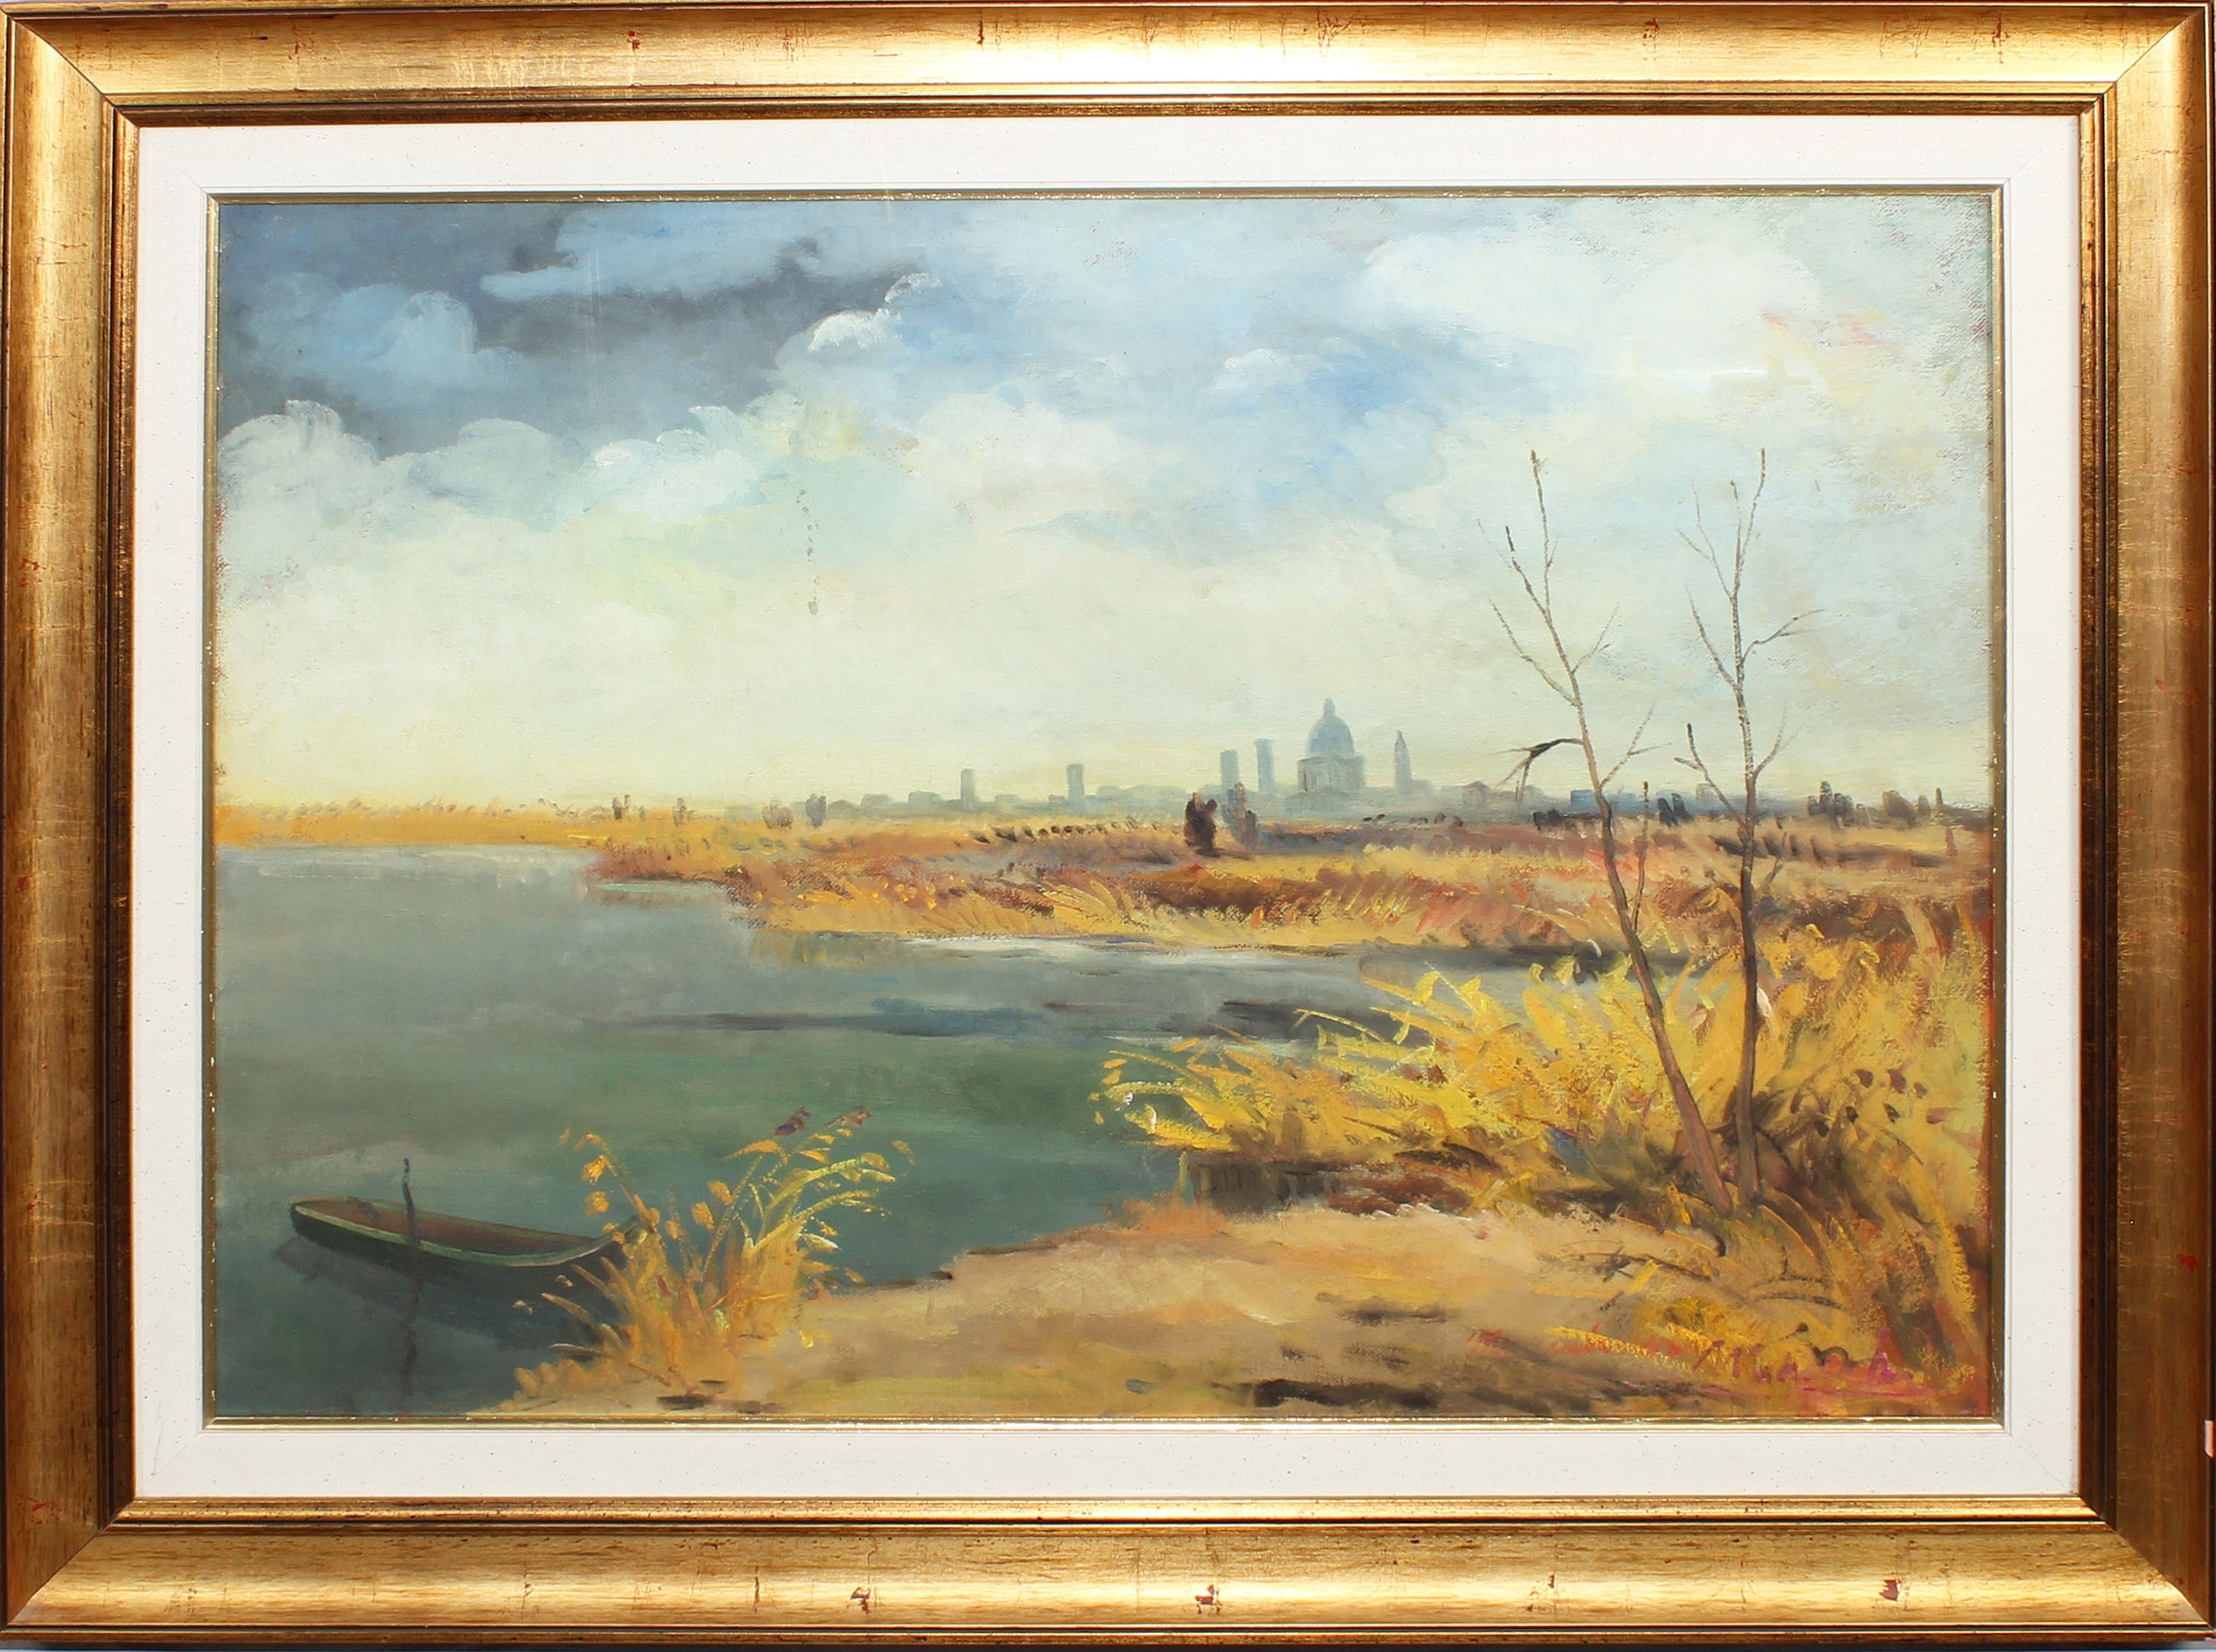 Lot 38 - Veduta di Mantova, a firma Ugo Maccabruni 1975, olio su tela, cm. 78x58